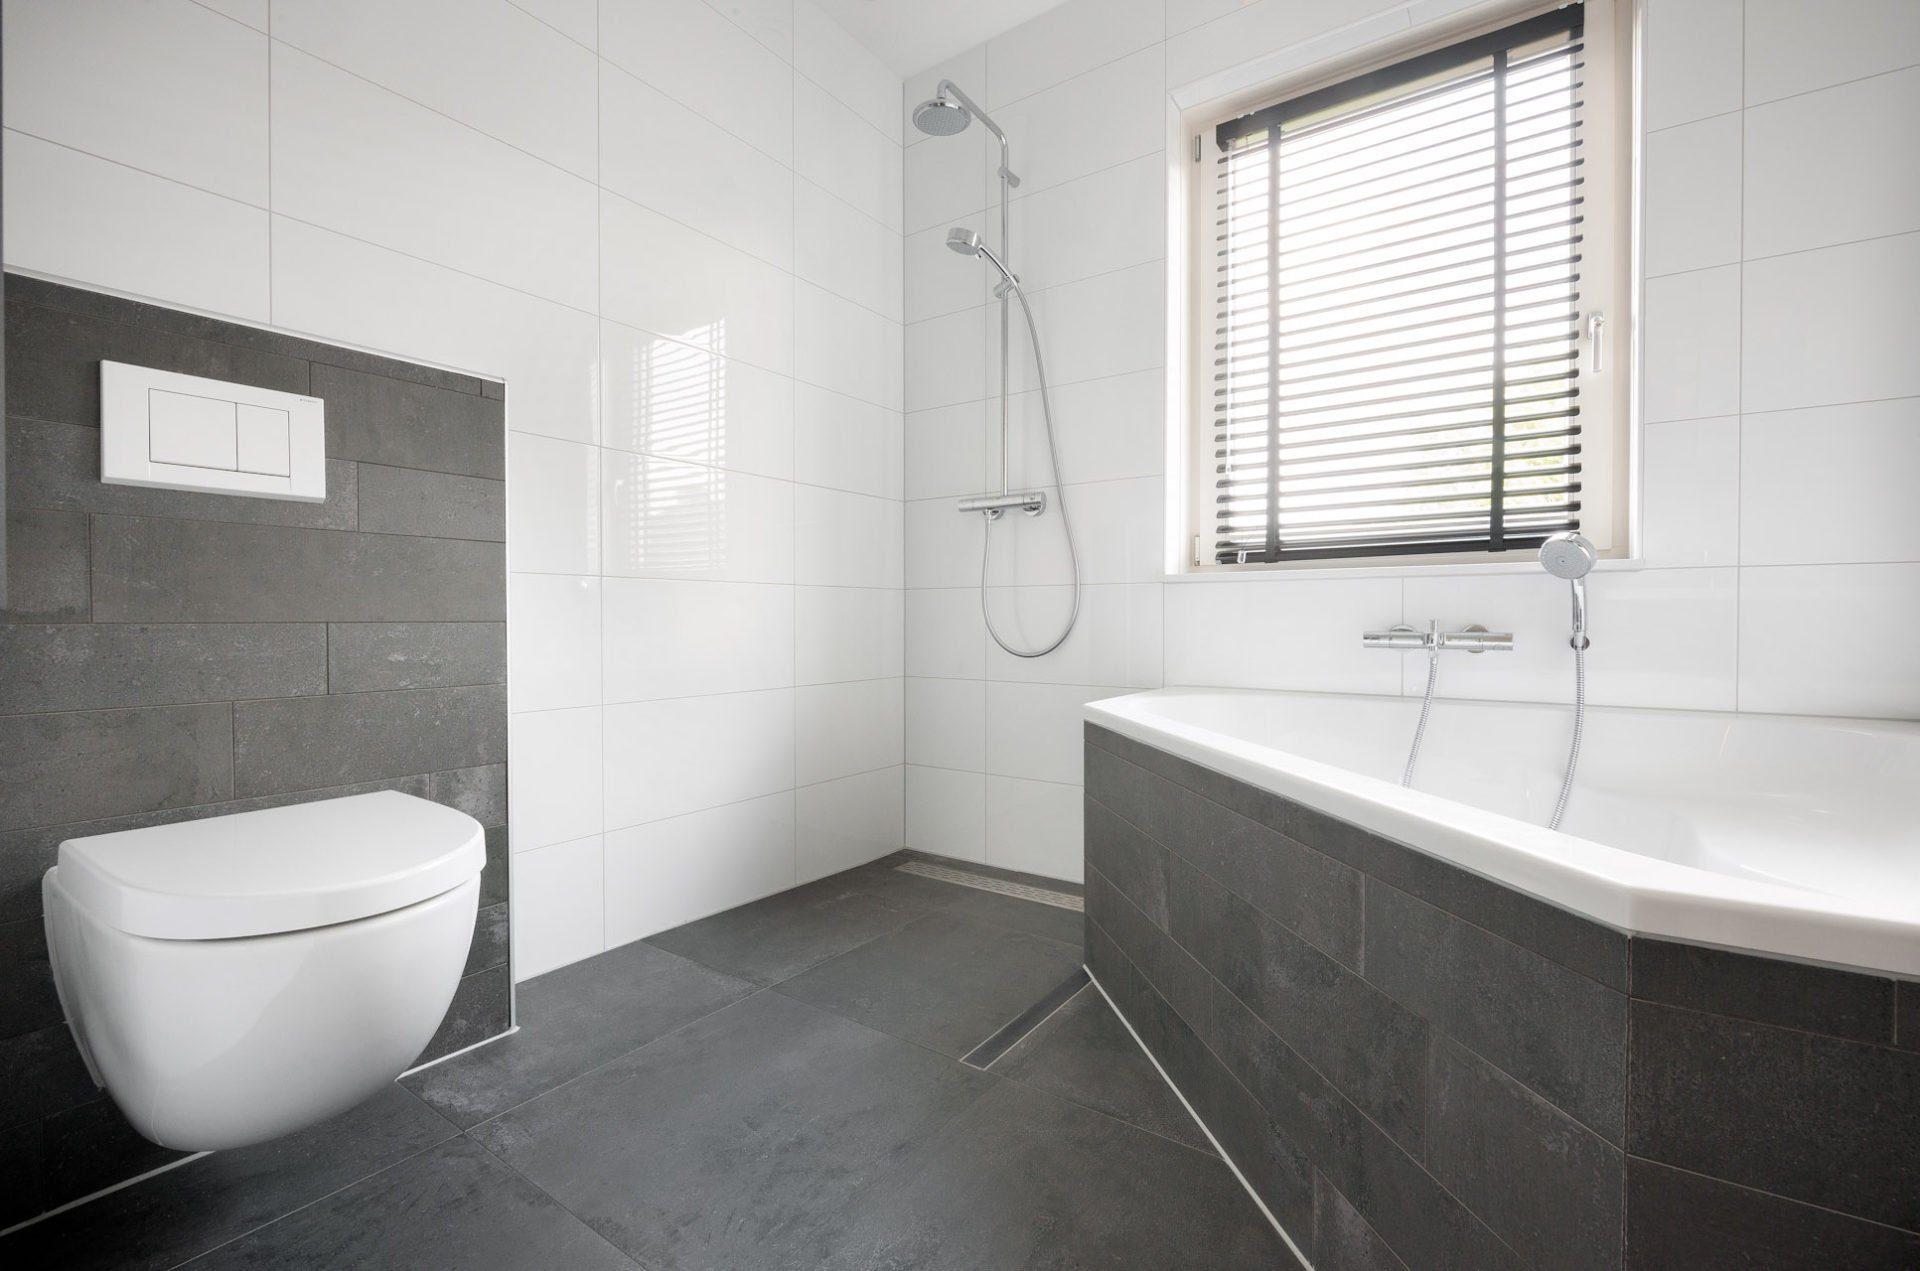 Antraciet vloertegels in woonkamer en badkamer - Badkamer zwarte vloer ...